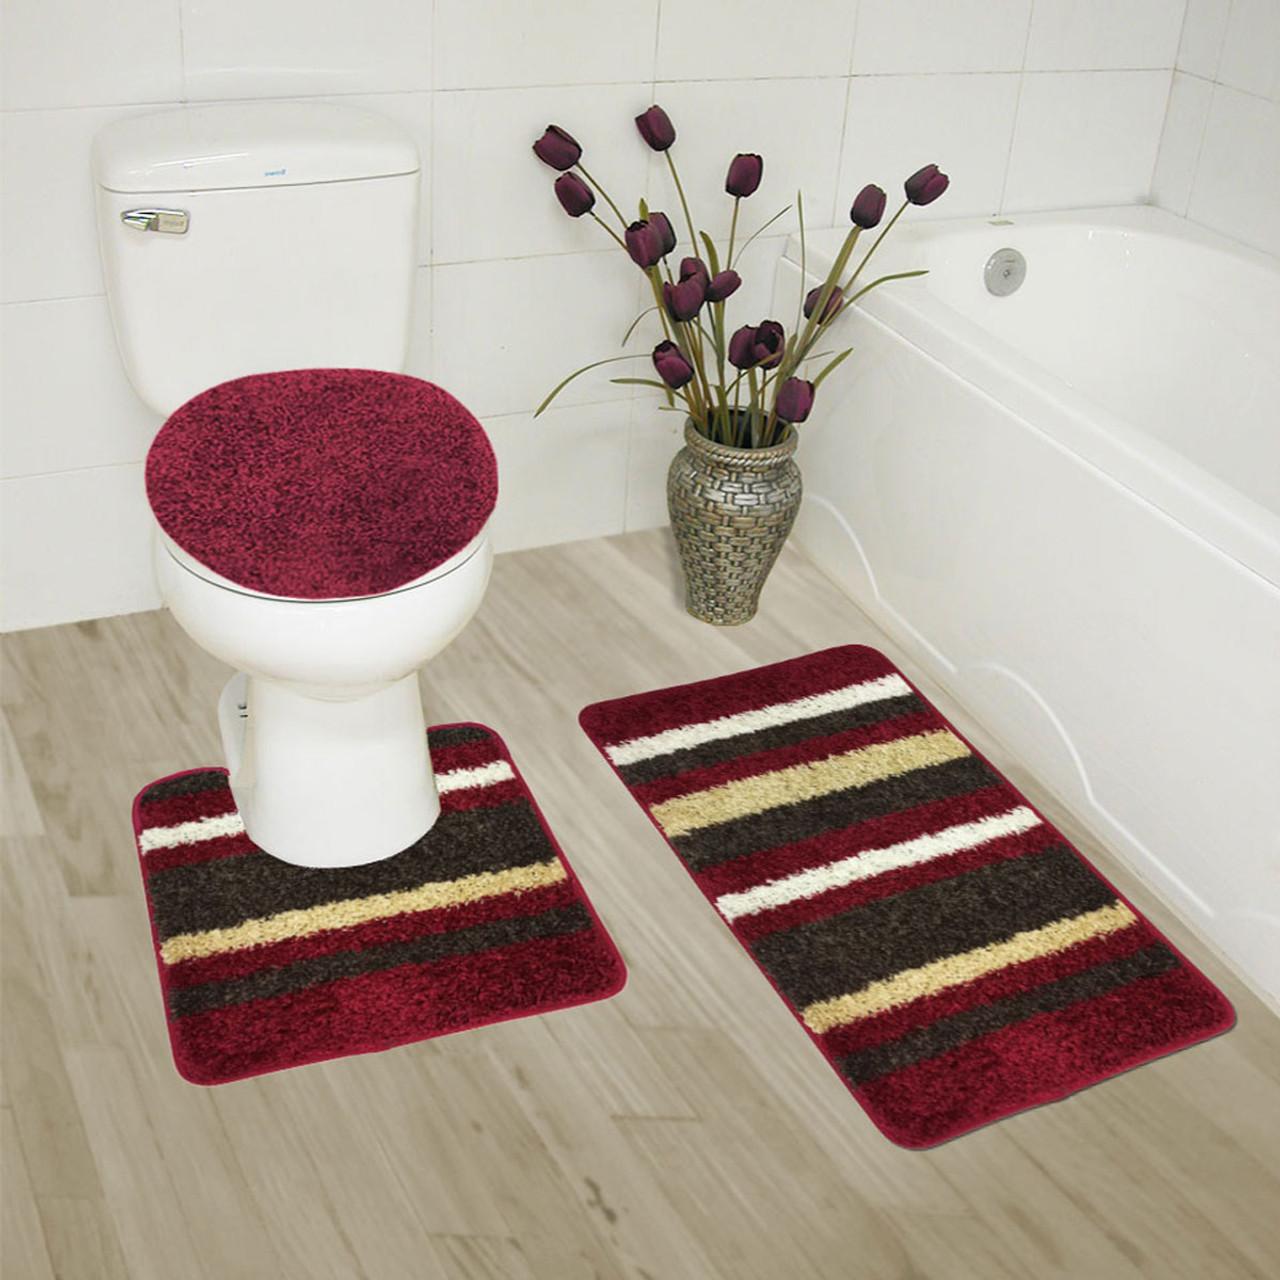 Bathroom Rug Set 3 Pc Bath Rug Contour Rug Lid Cover High Pile